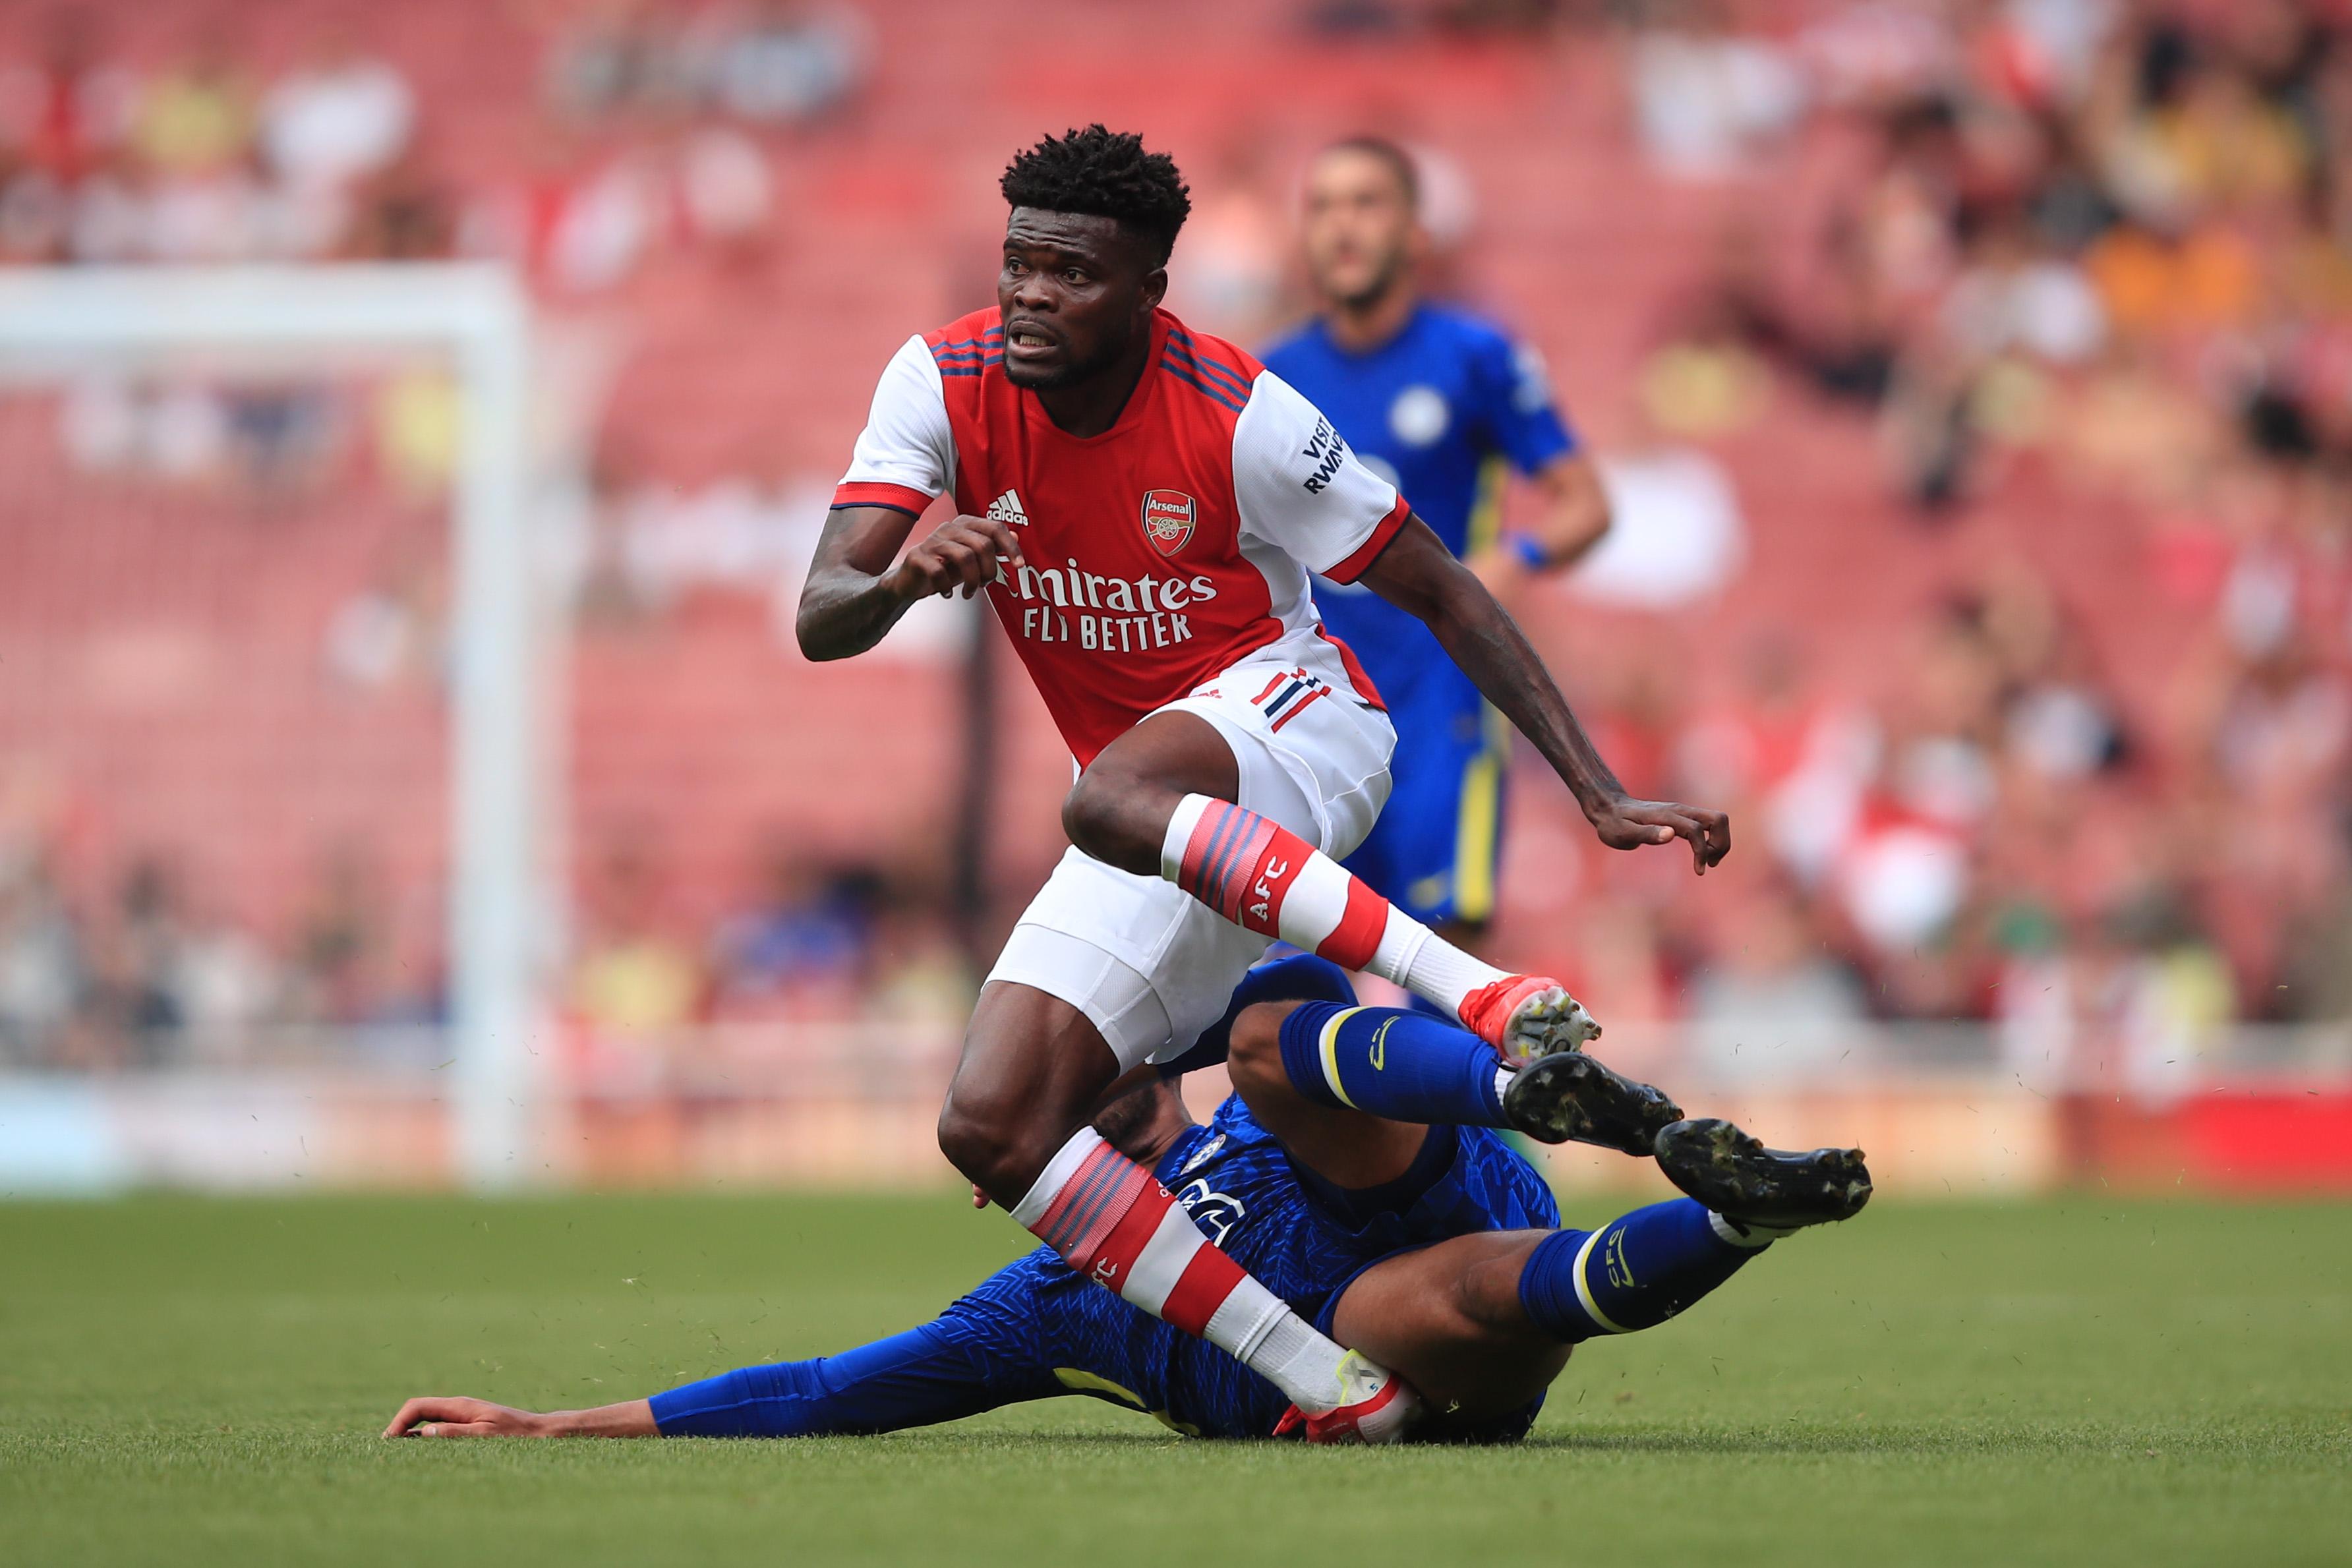 Thomas Partey's injury is 'not looking good' - Arsenal boss Arteta